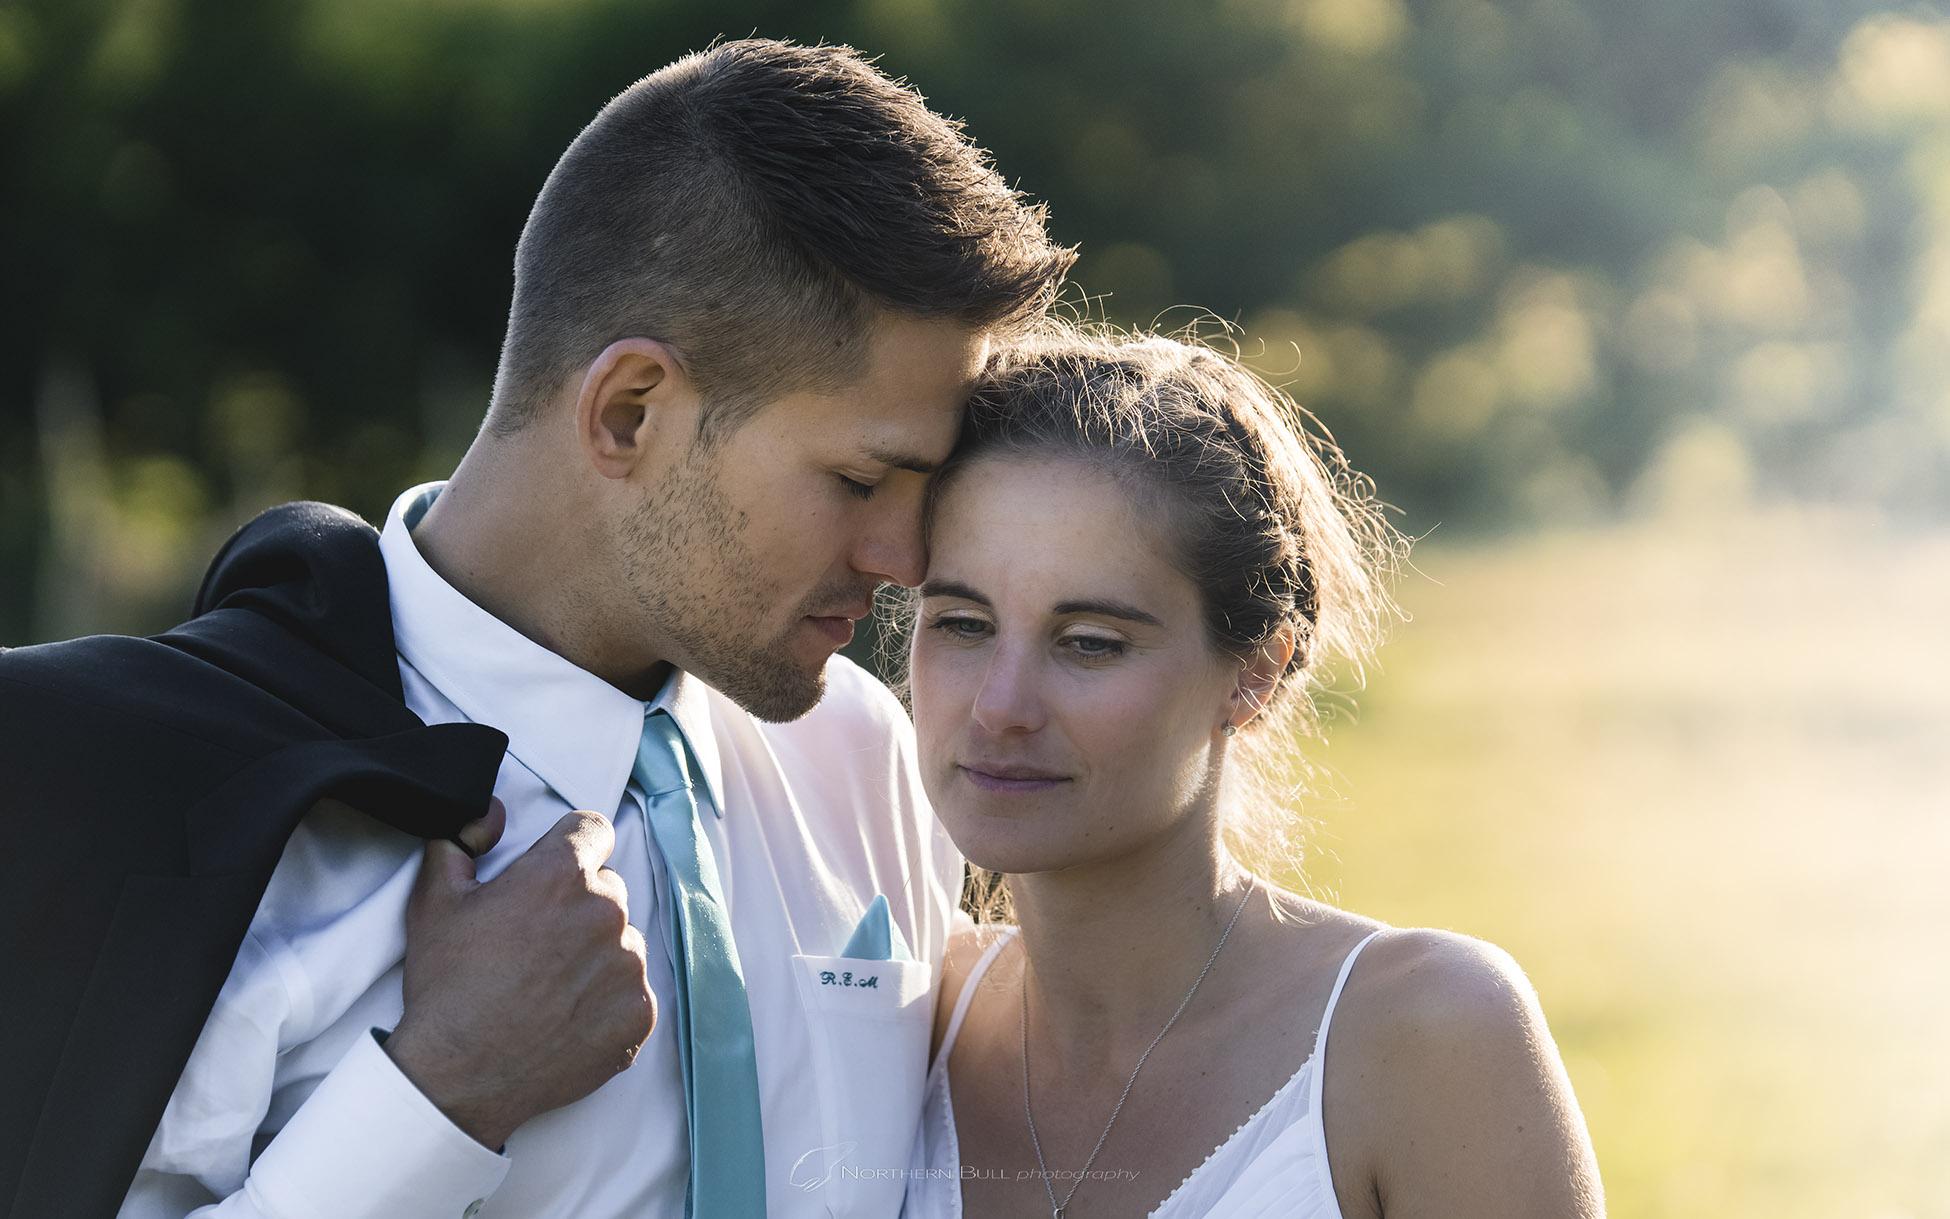 wedding_shot_by_norhtern_bull.jpg